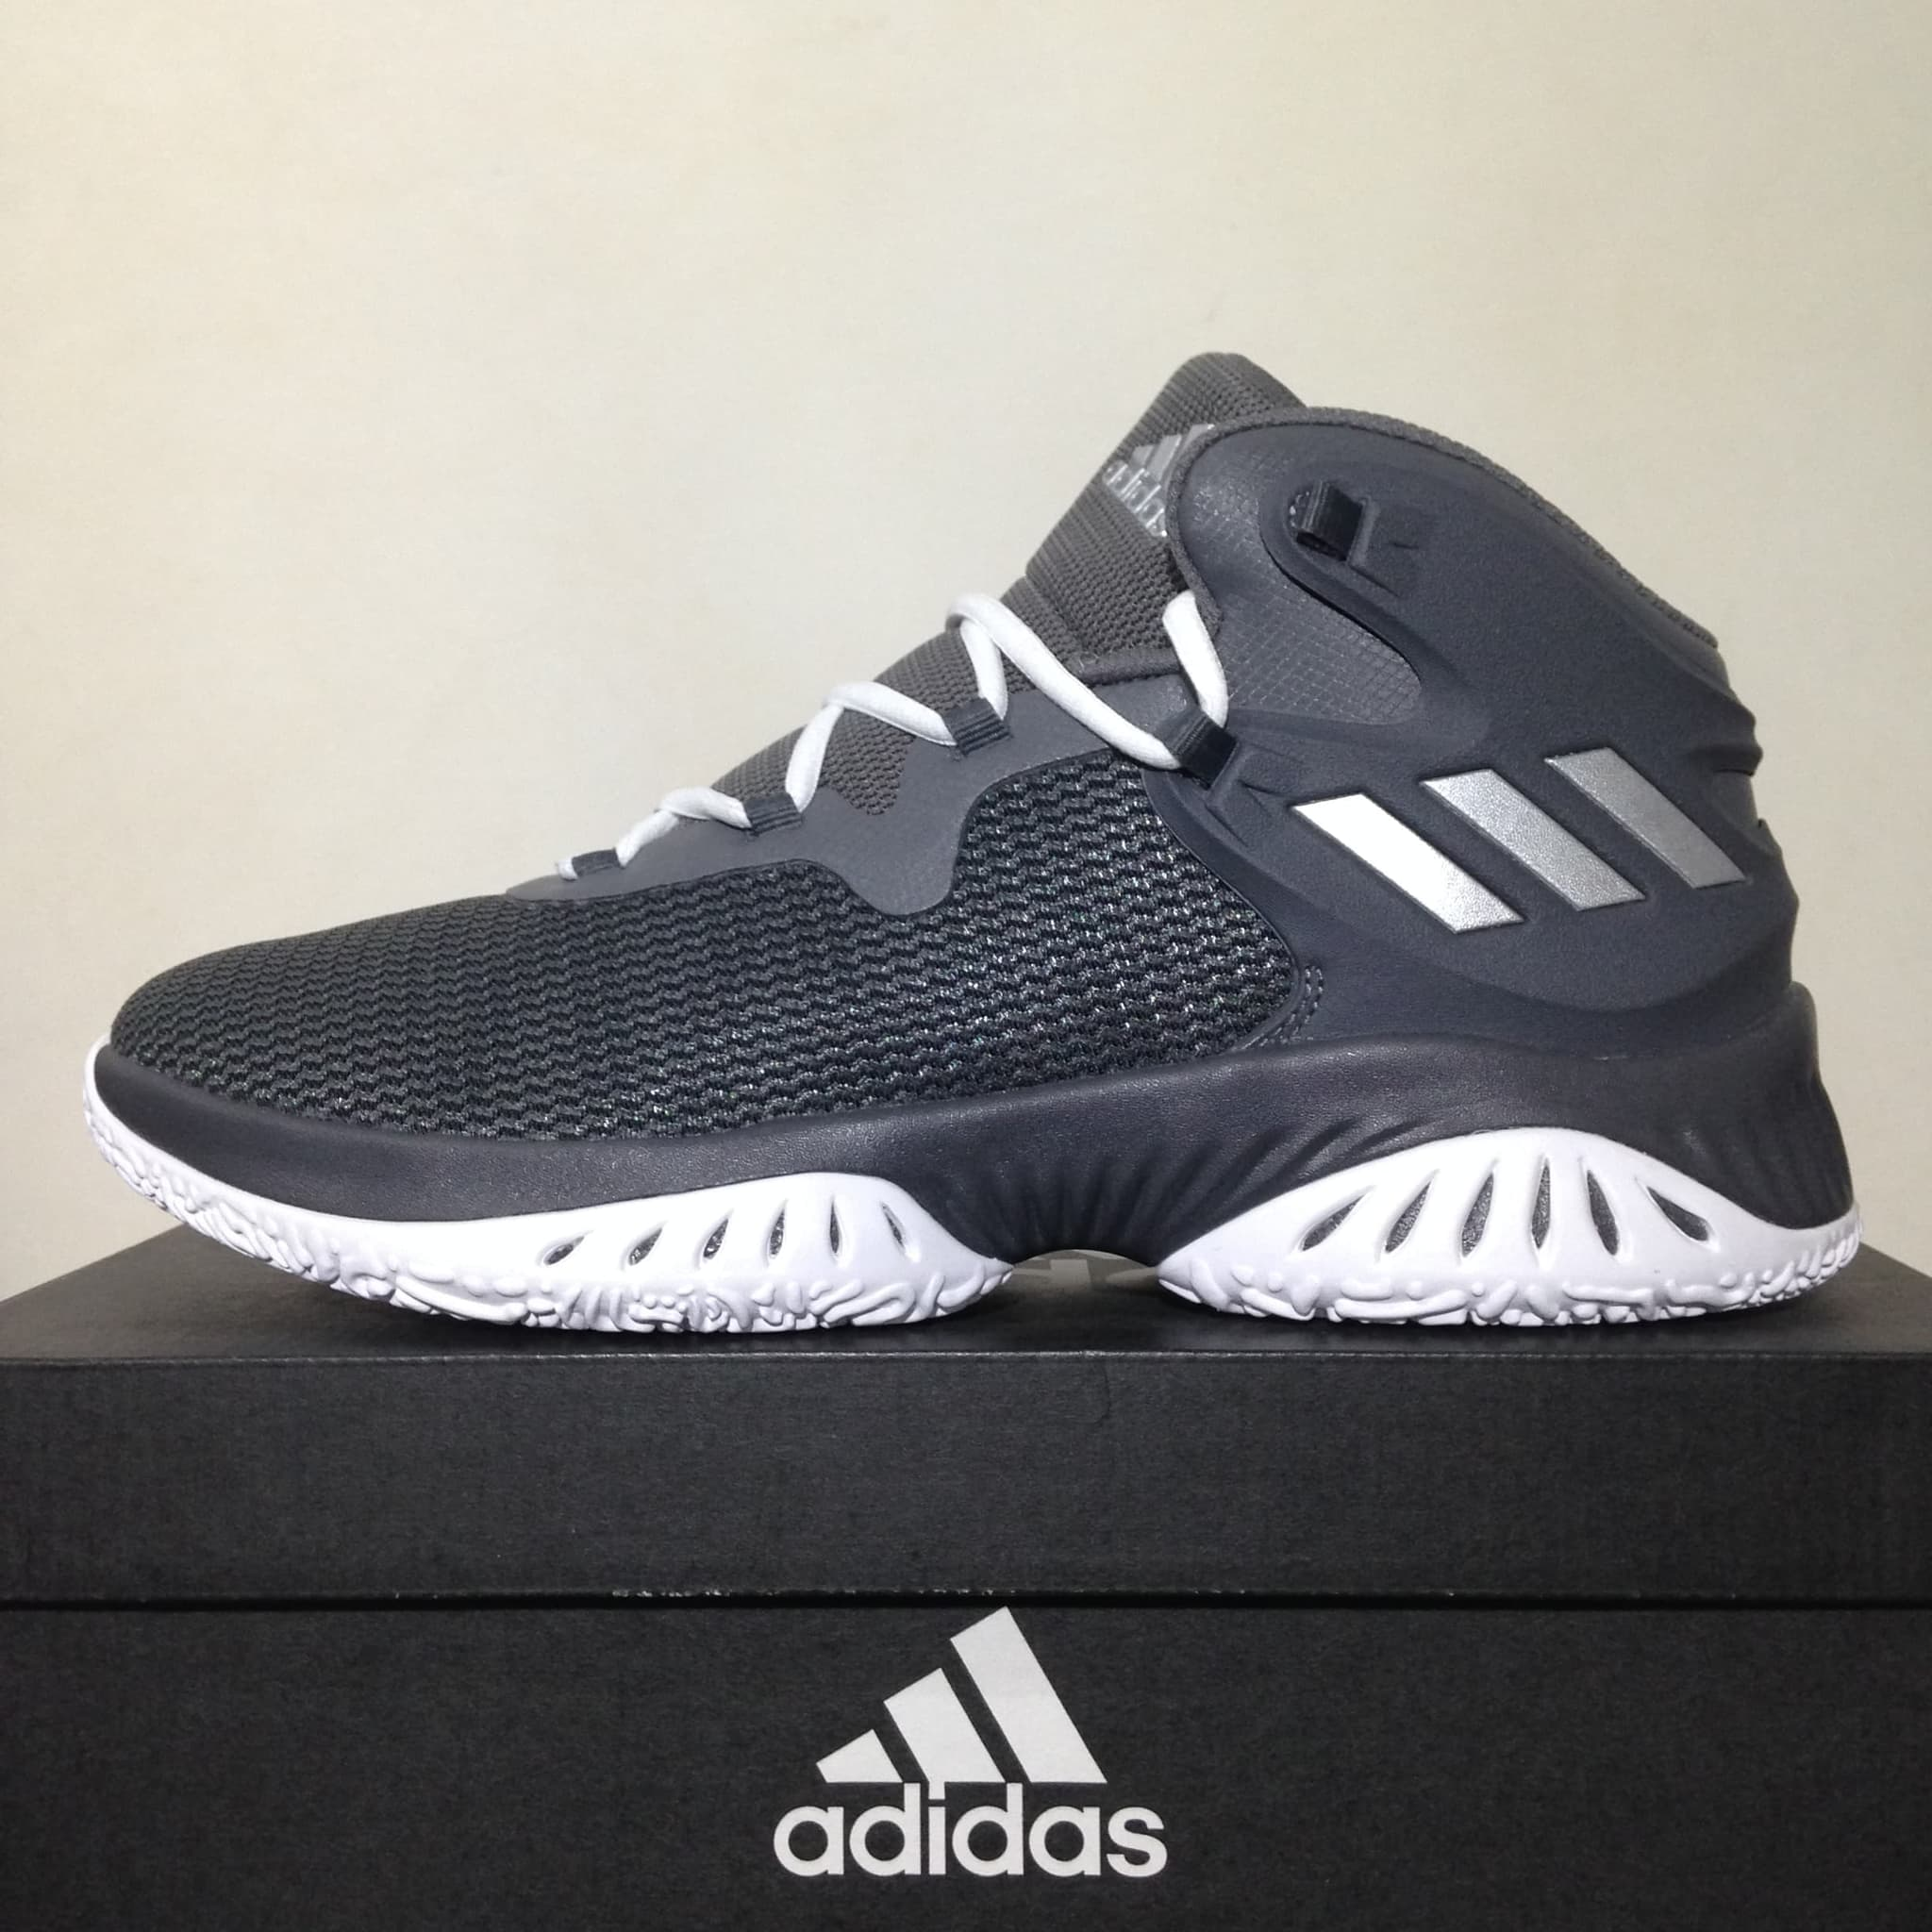 Jual Sepatu Basket Adidas Explosive Bounce Grey Four By3779 Original ... afbe00118e